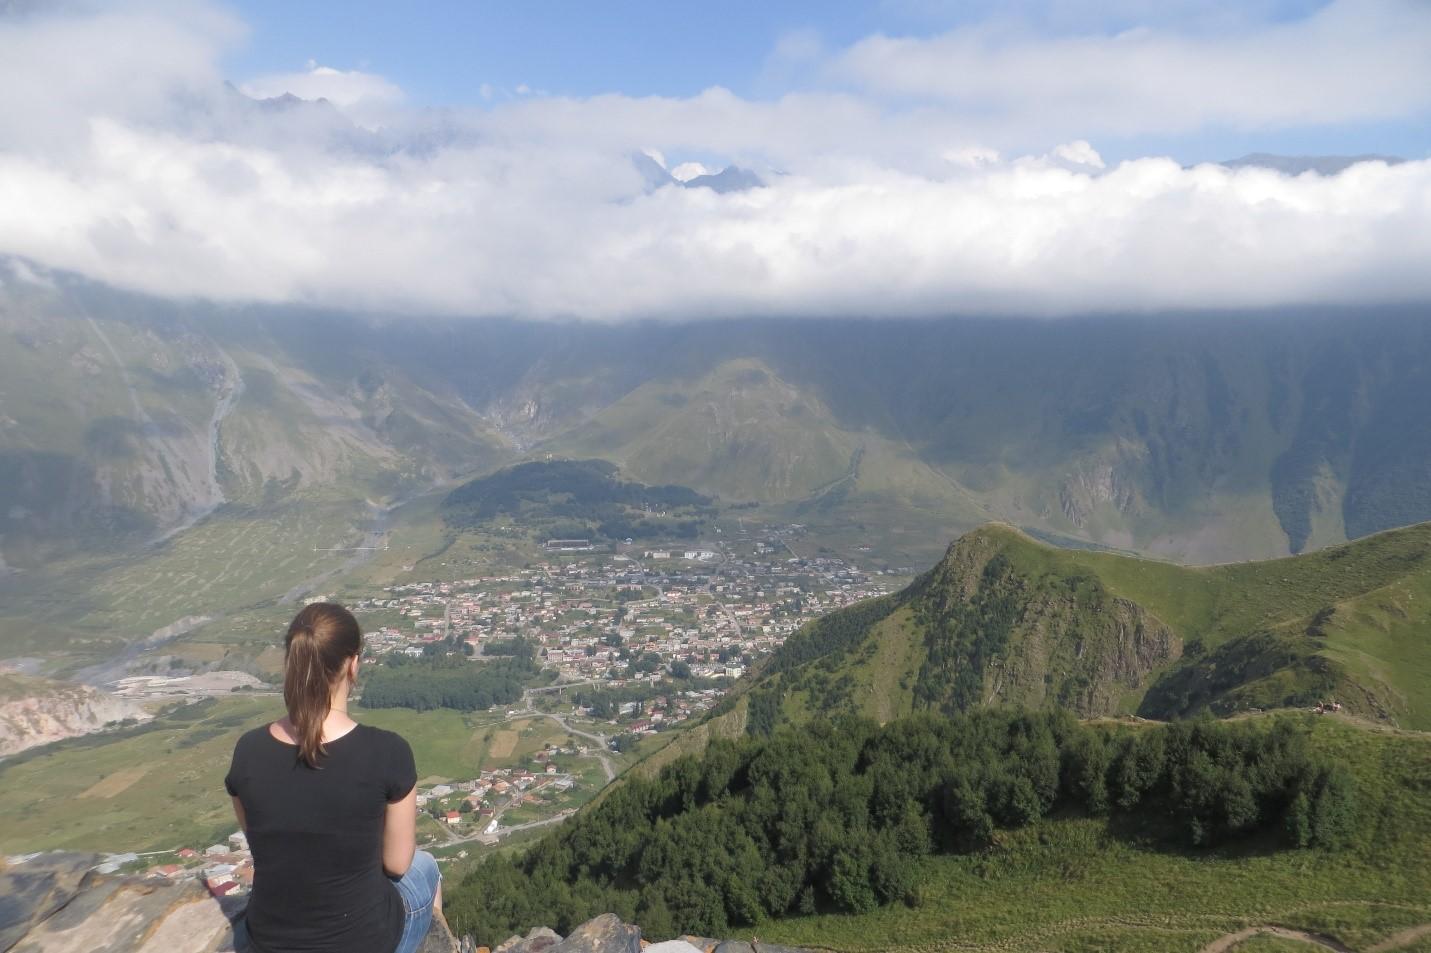 View from Mount Kazbegi